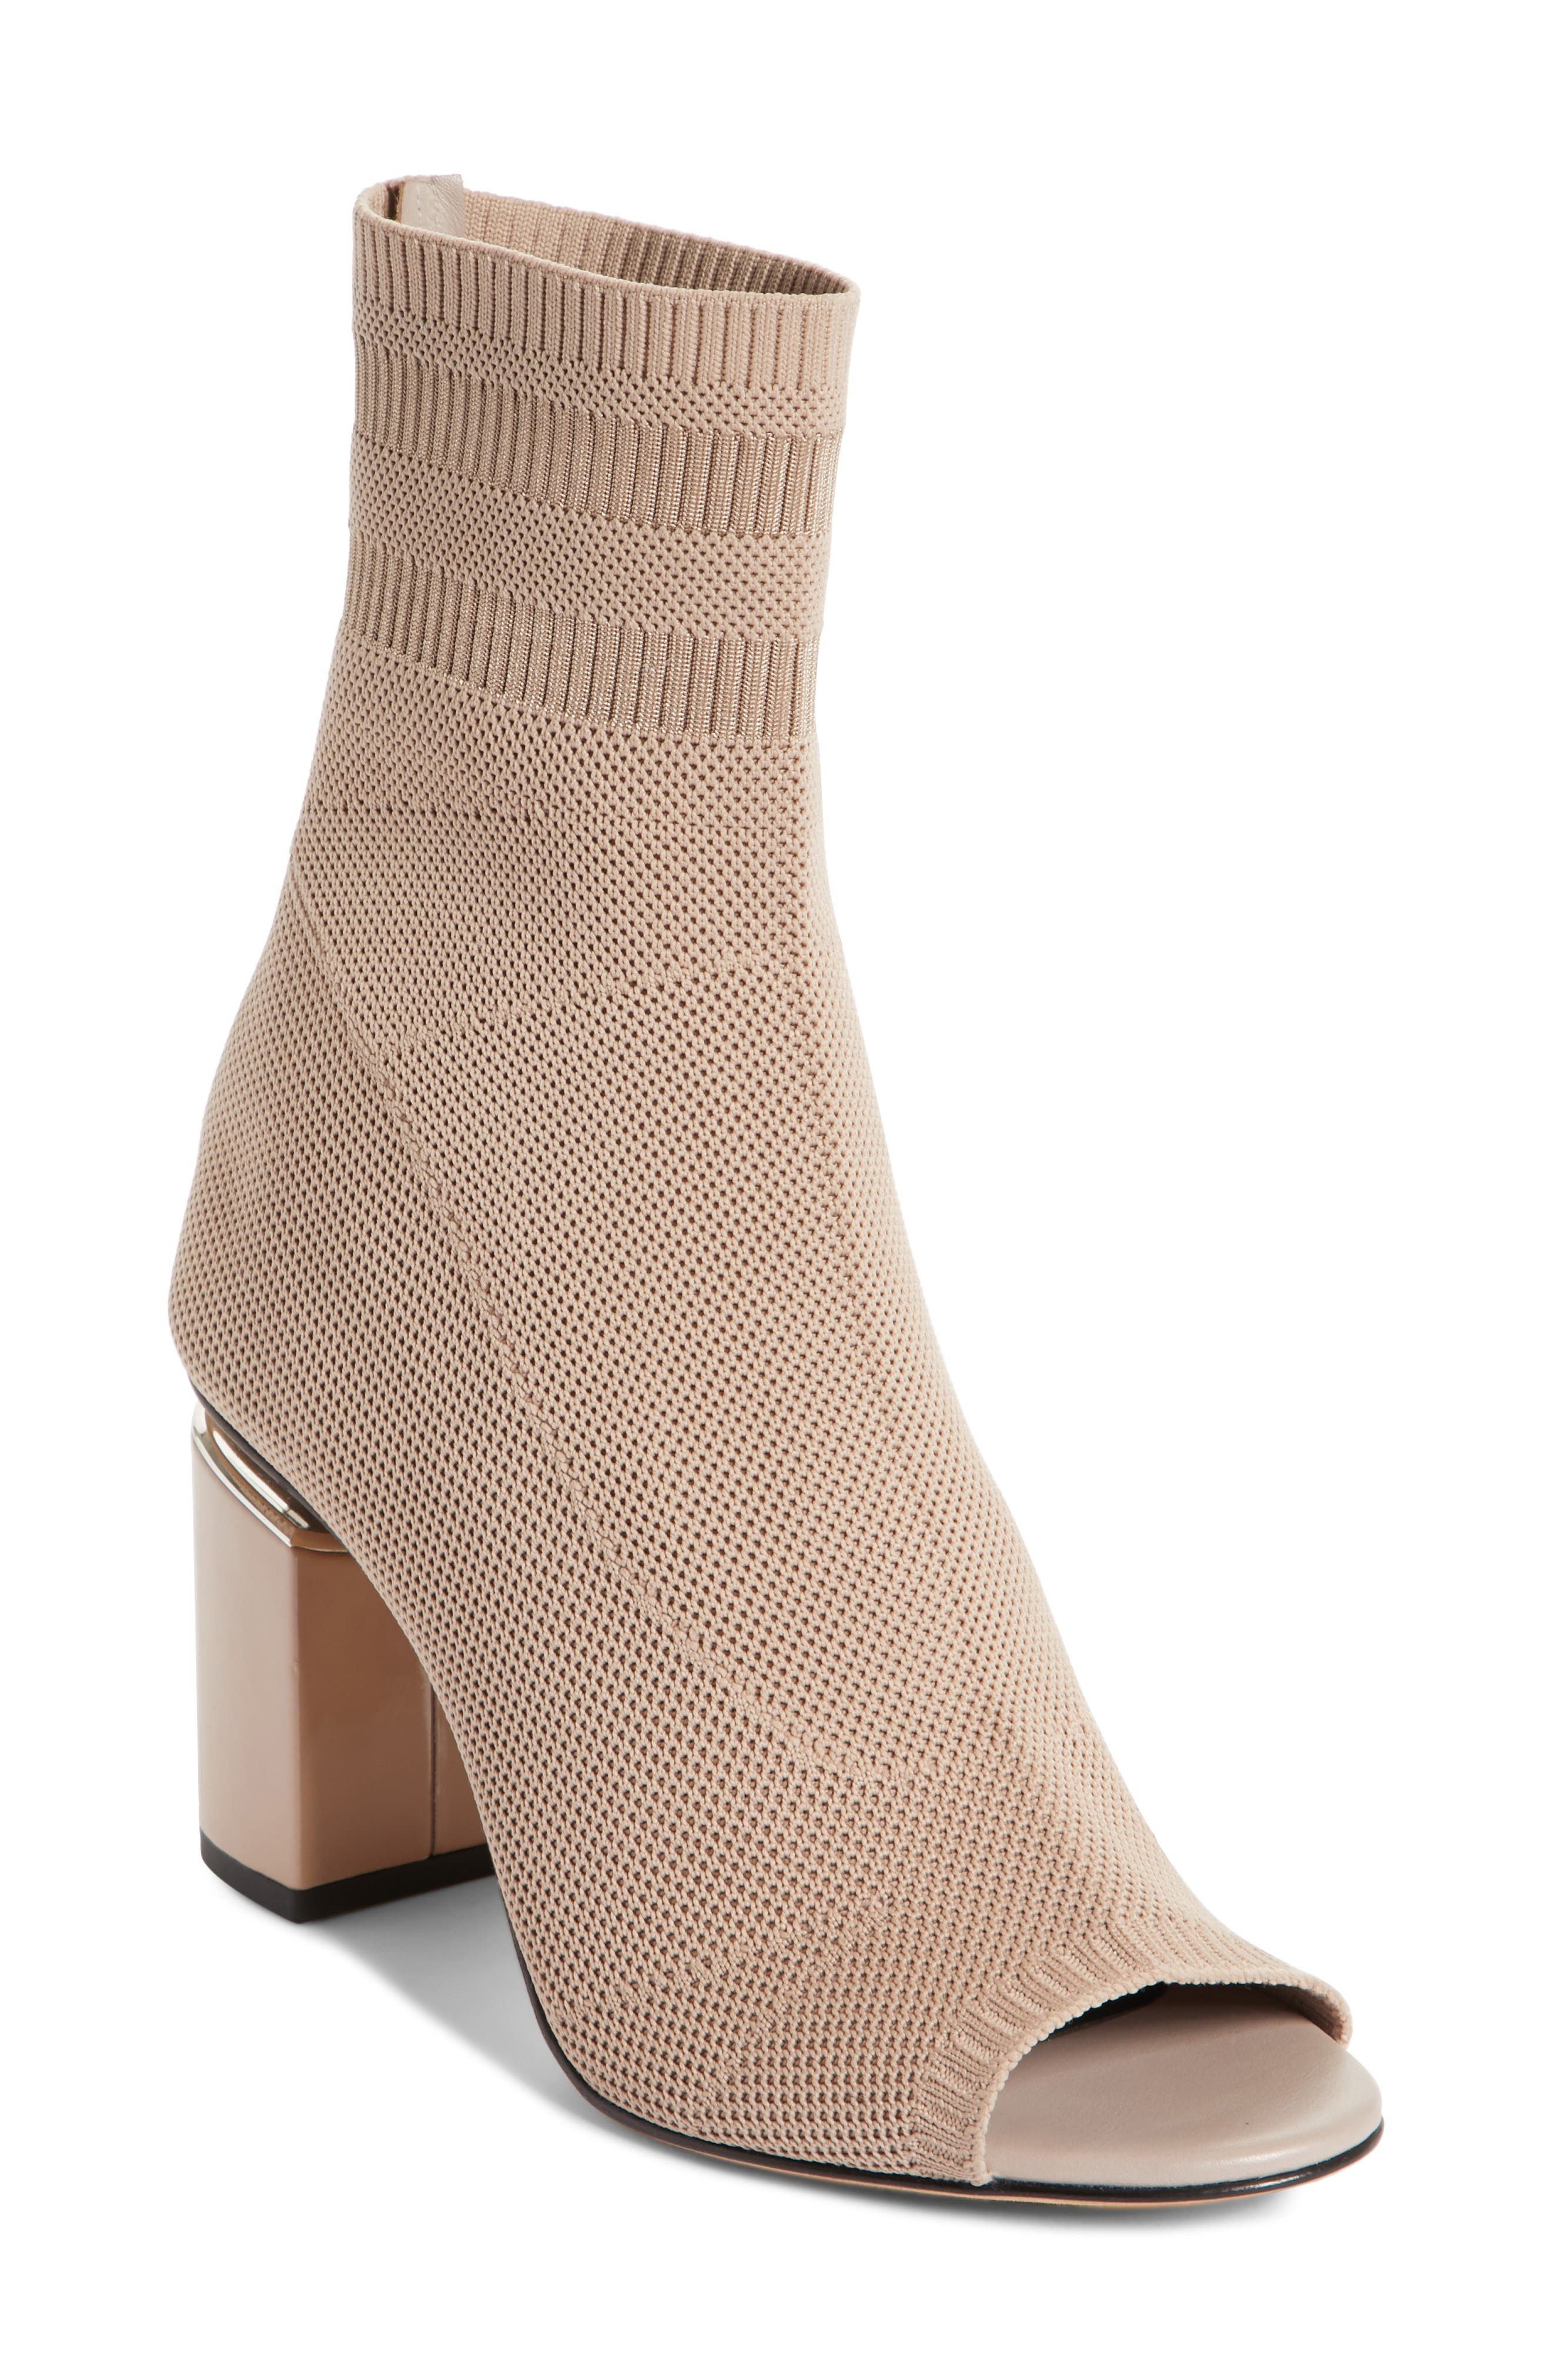 Cat Knit Sock Boot,                             Main thumbnail 1, color,                             Nude